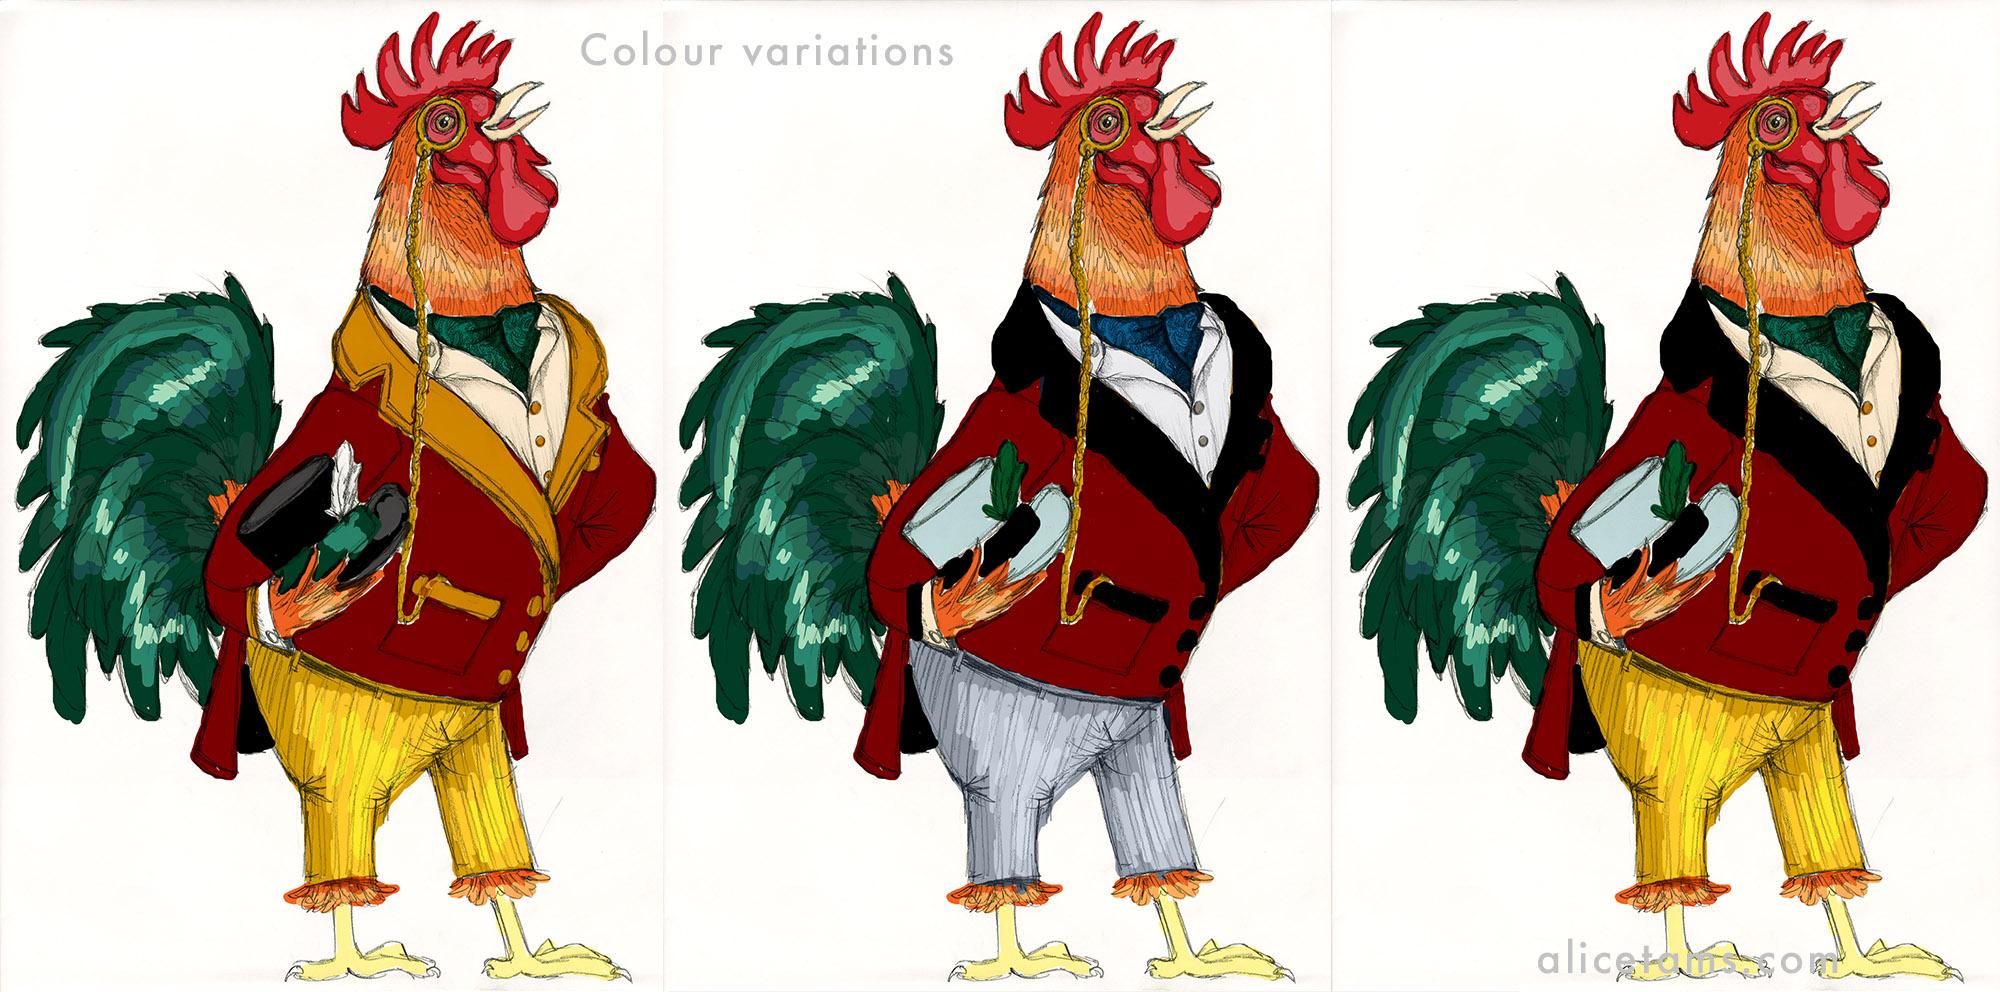 colour variations.jpg